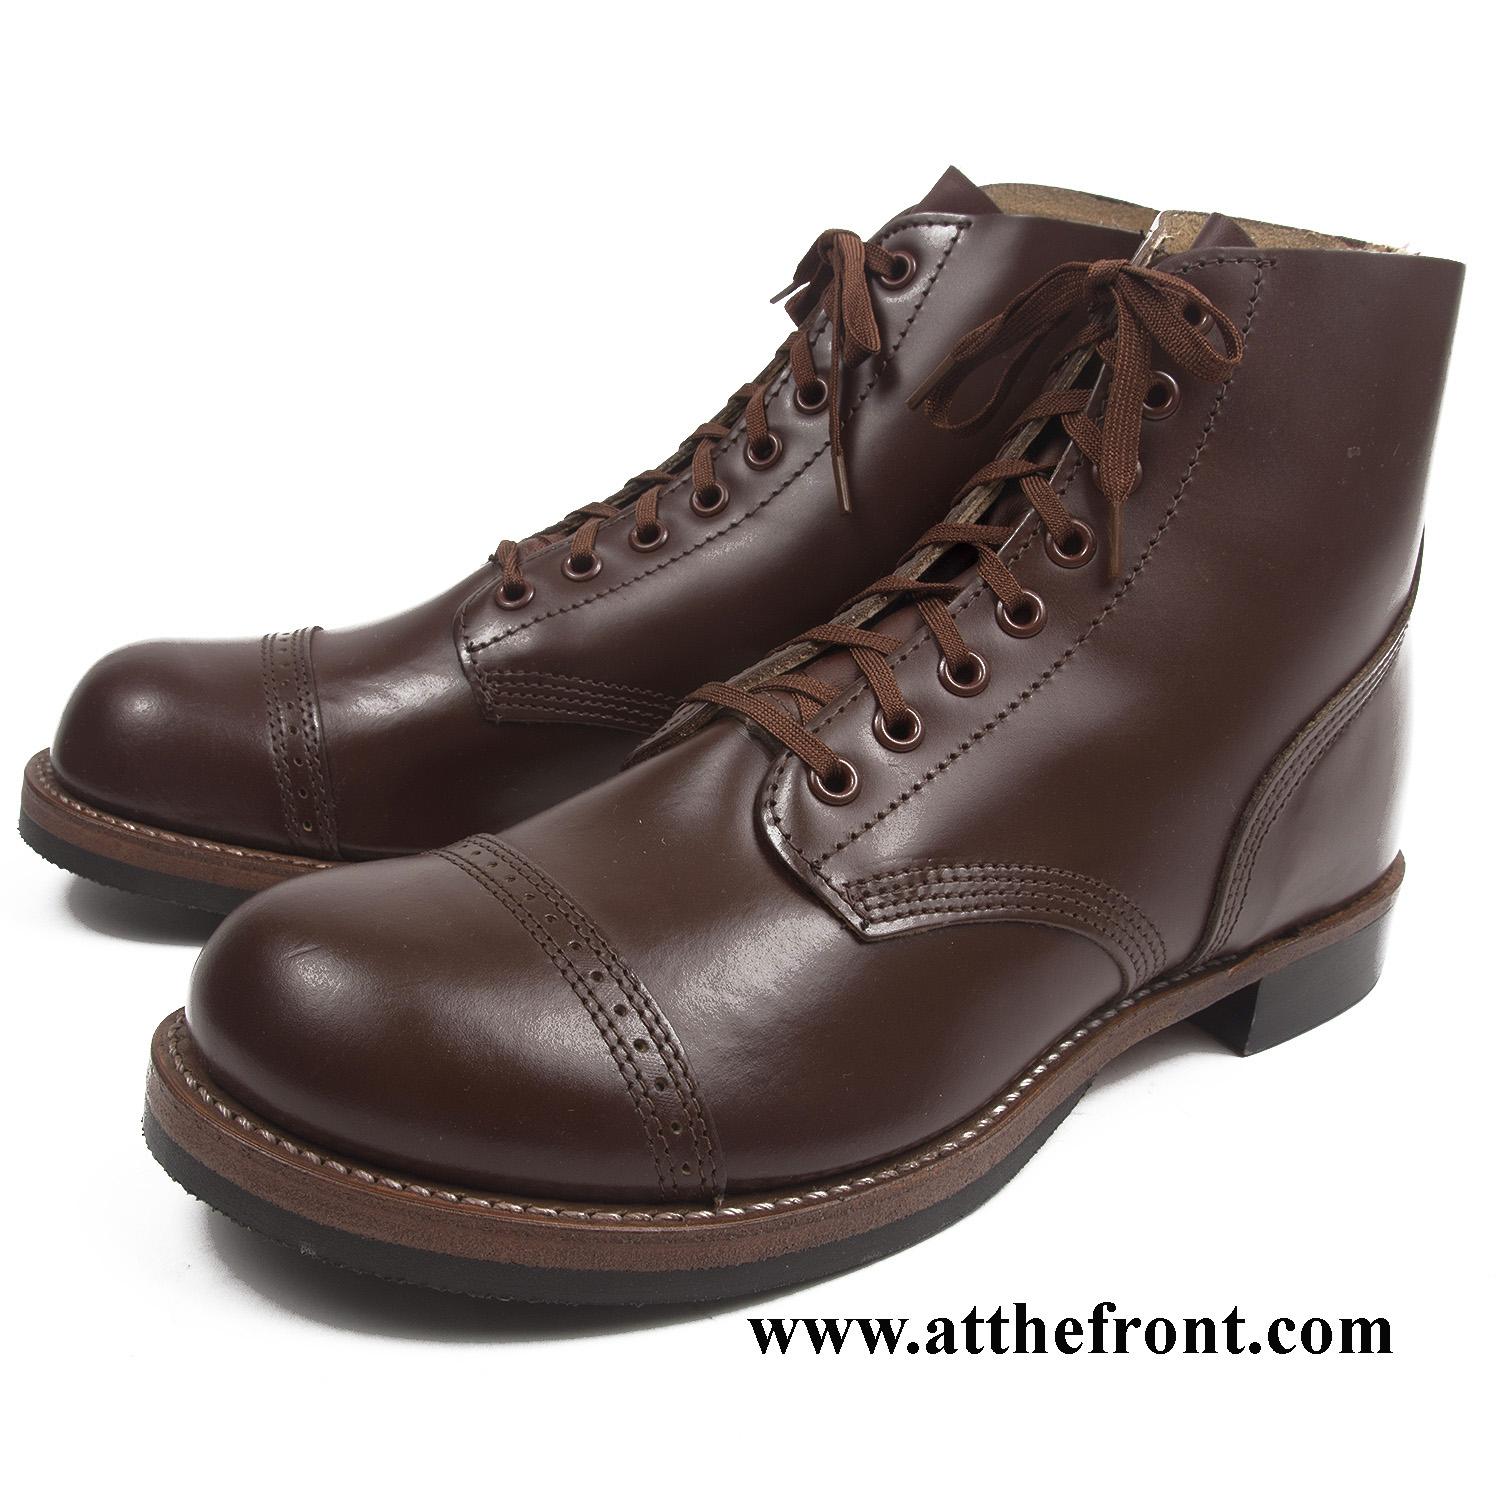 c29bef91e7da5 US WWII Service Shoes, Type II - Made in USA